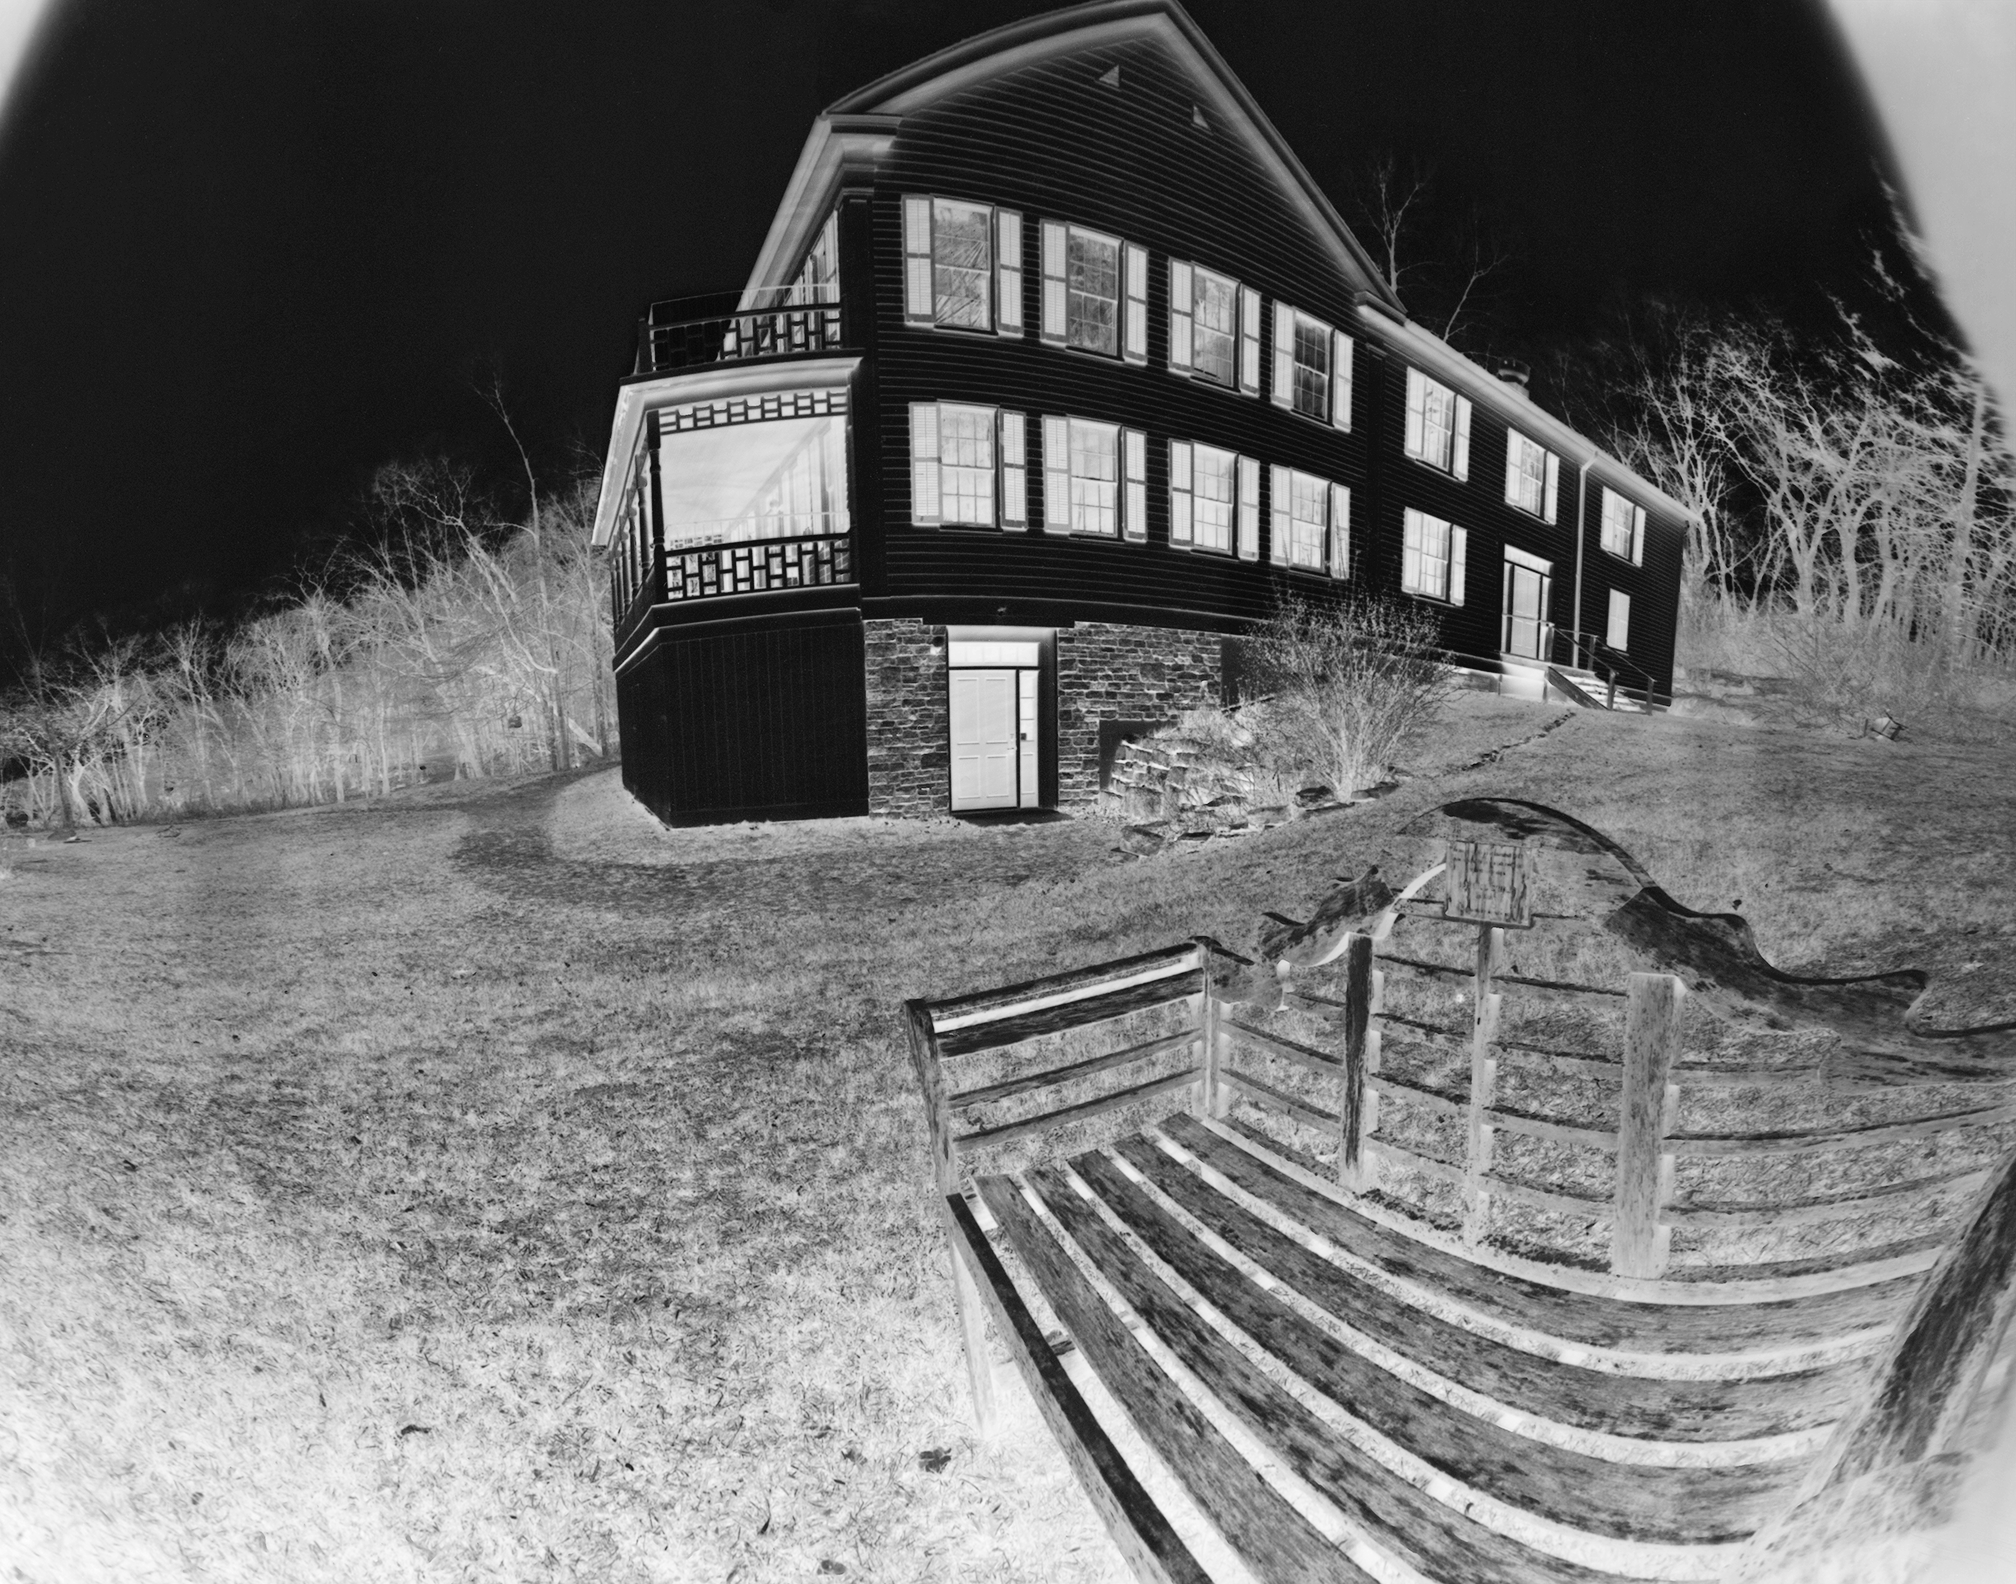 Mower Mansion: The Mower Mansion at Arcola Mills